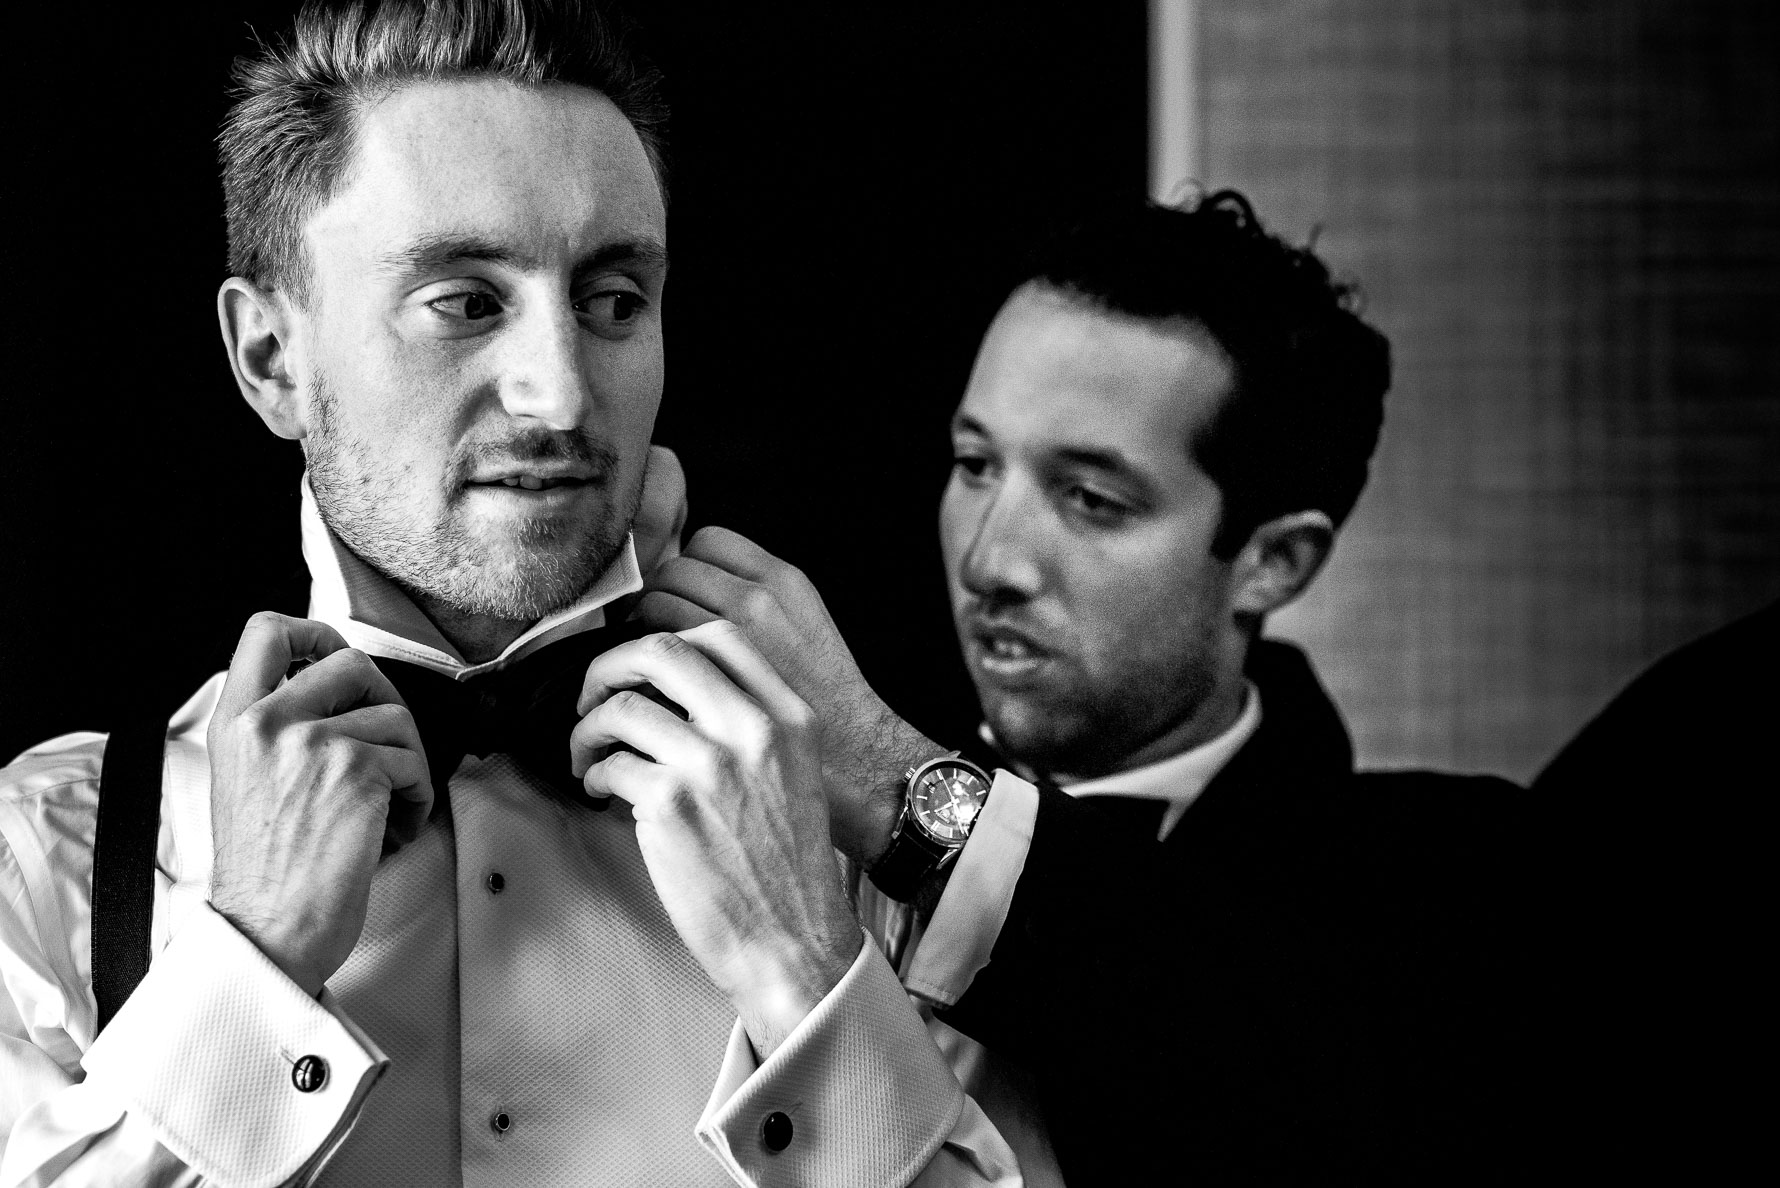 bow tie before wedding